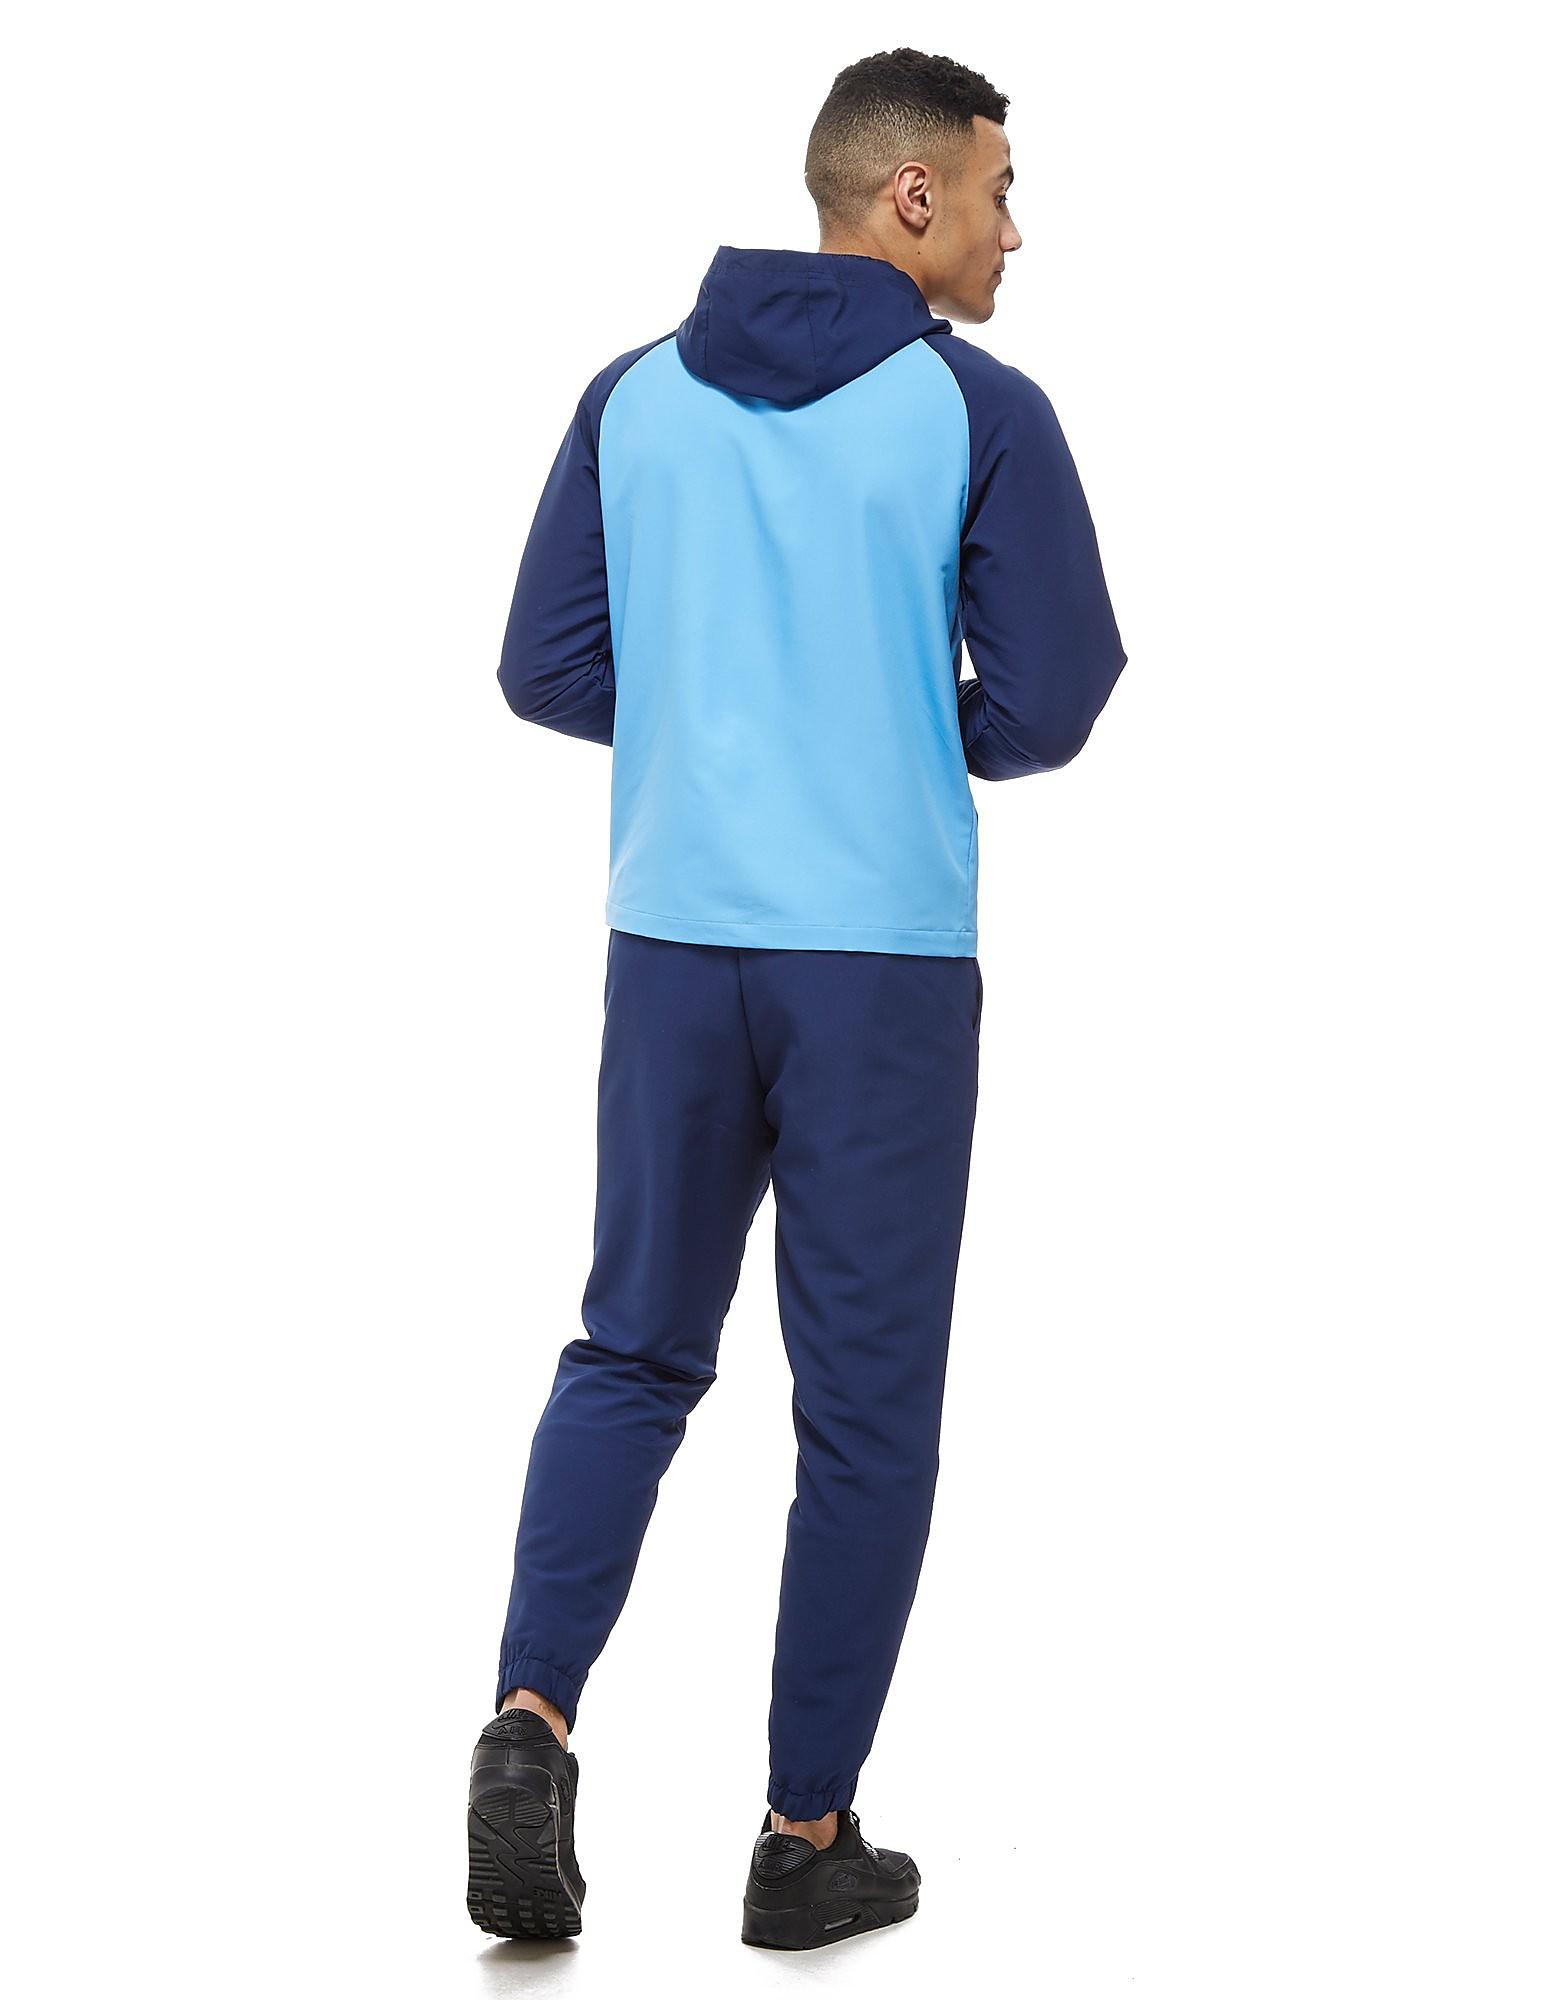 Nike Shut Out 2 Suit